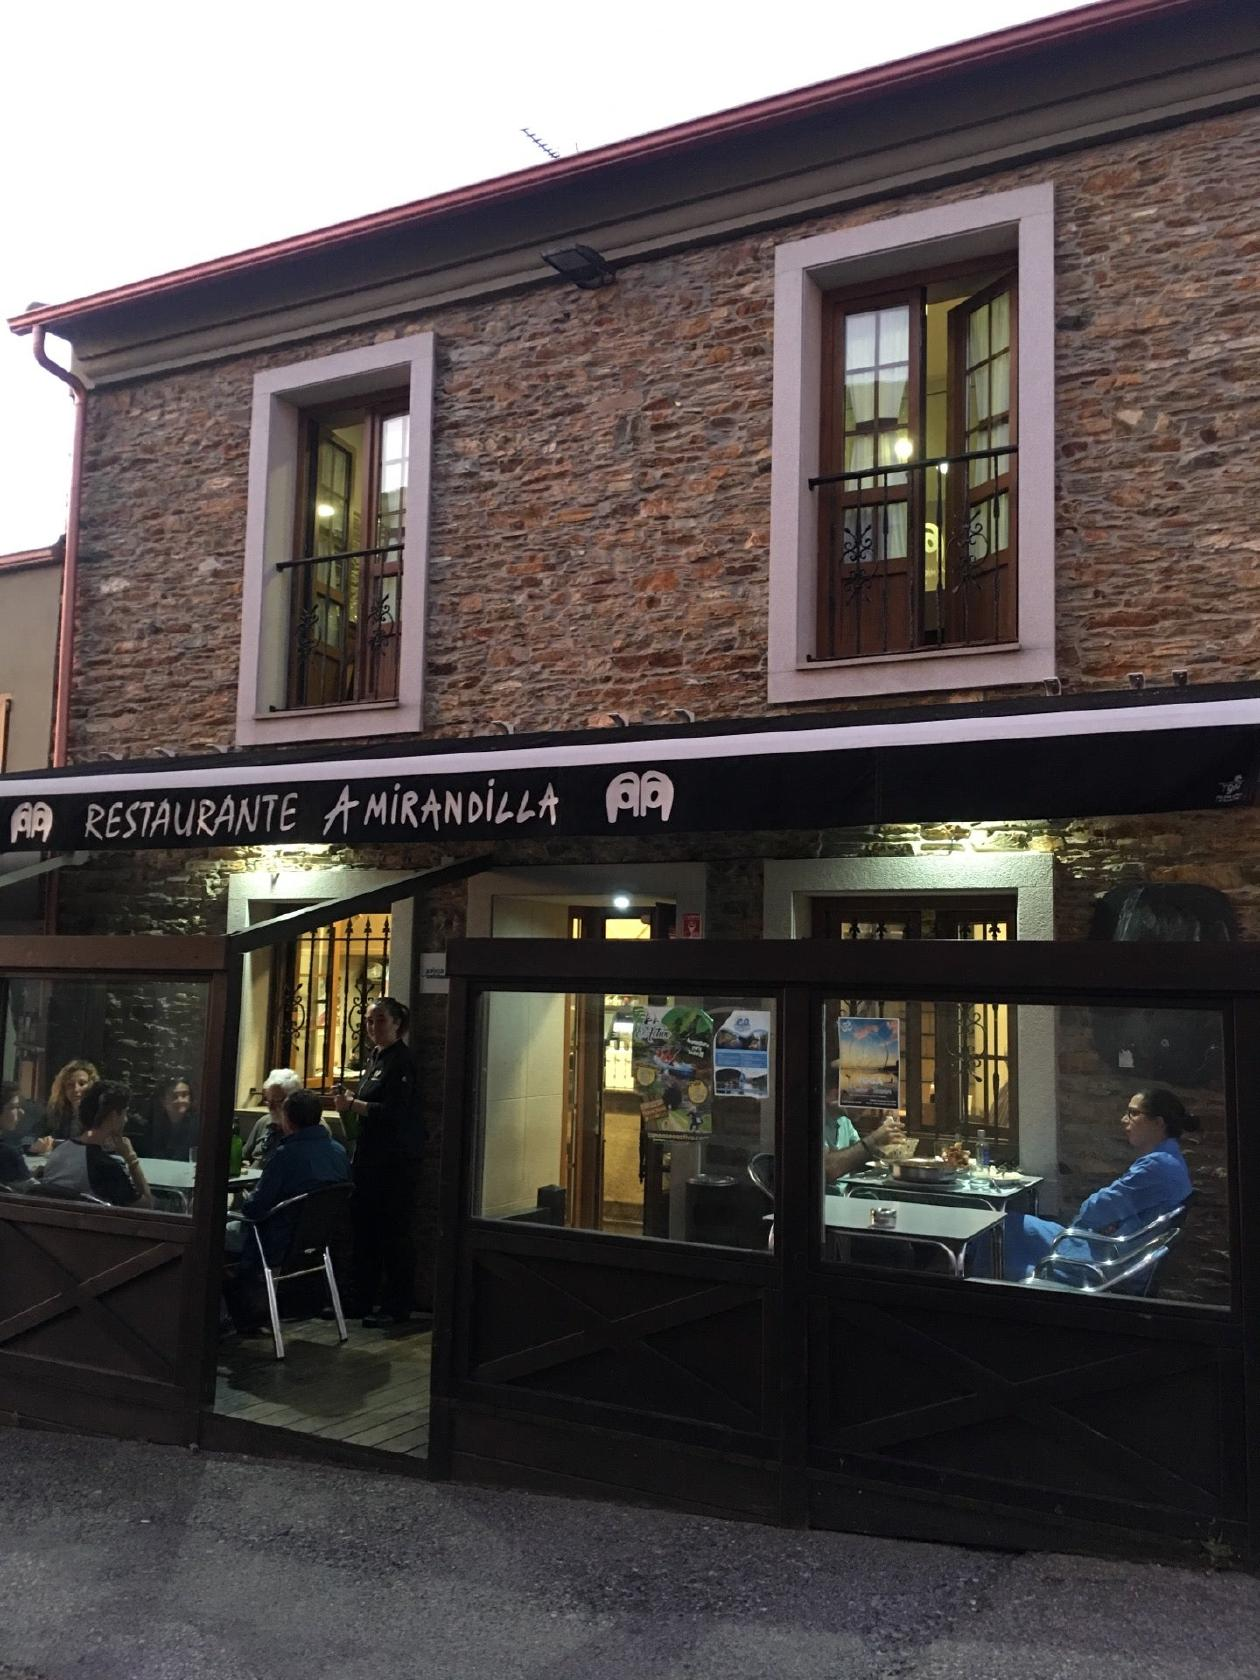 Restaurante A Mirandilla photo